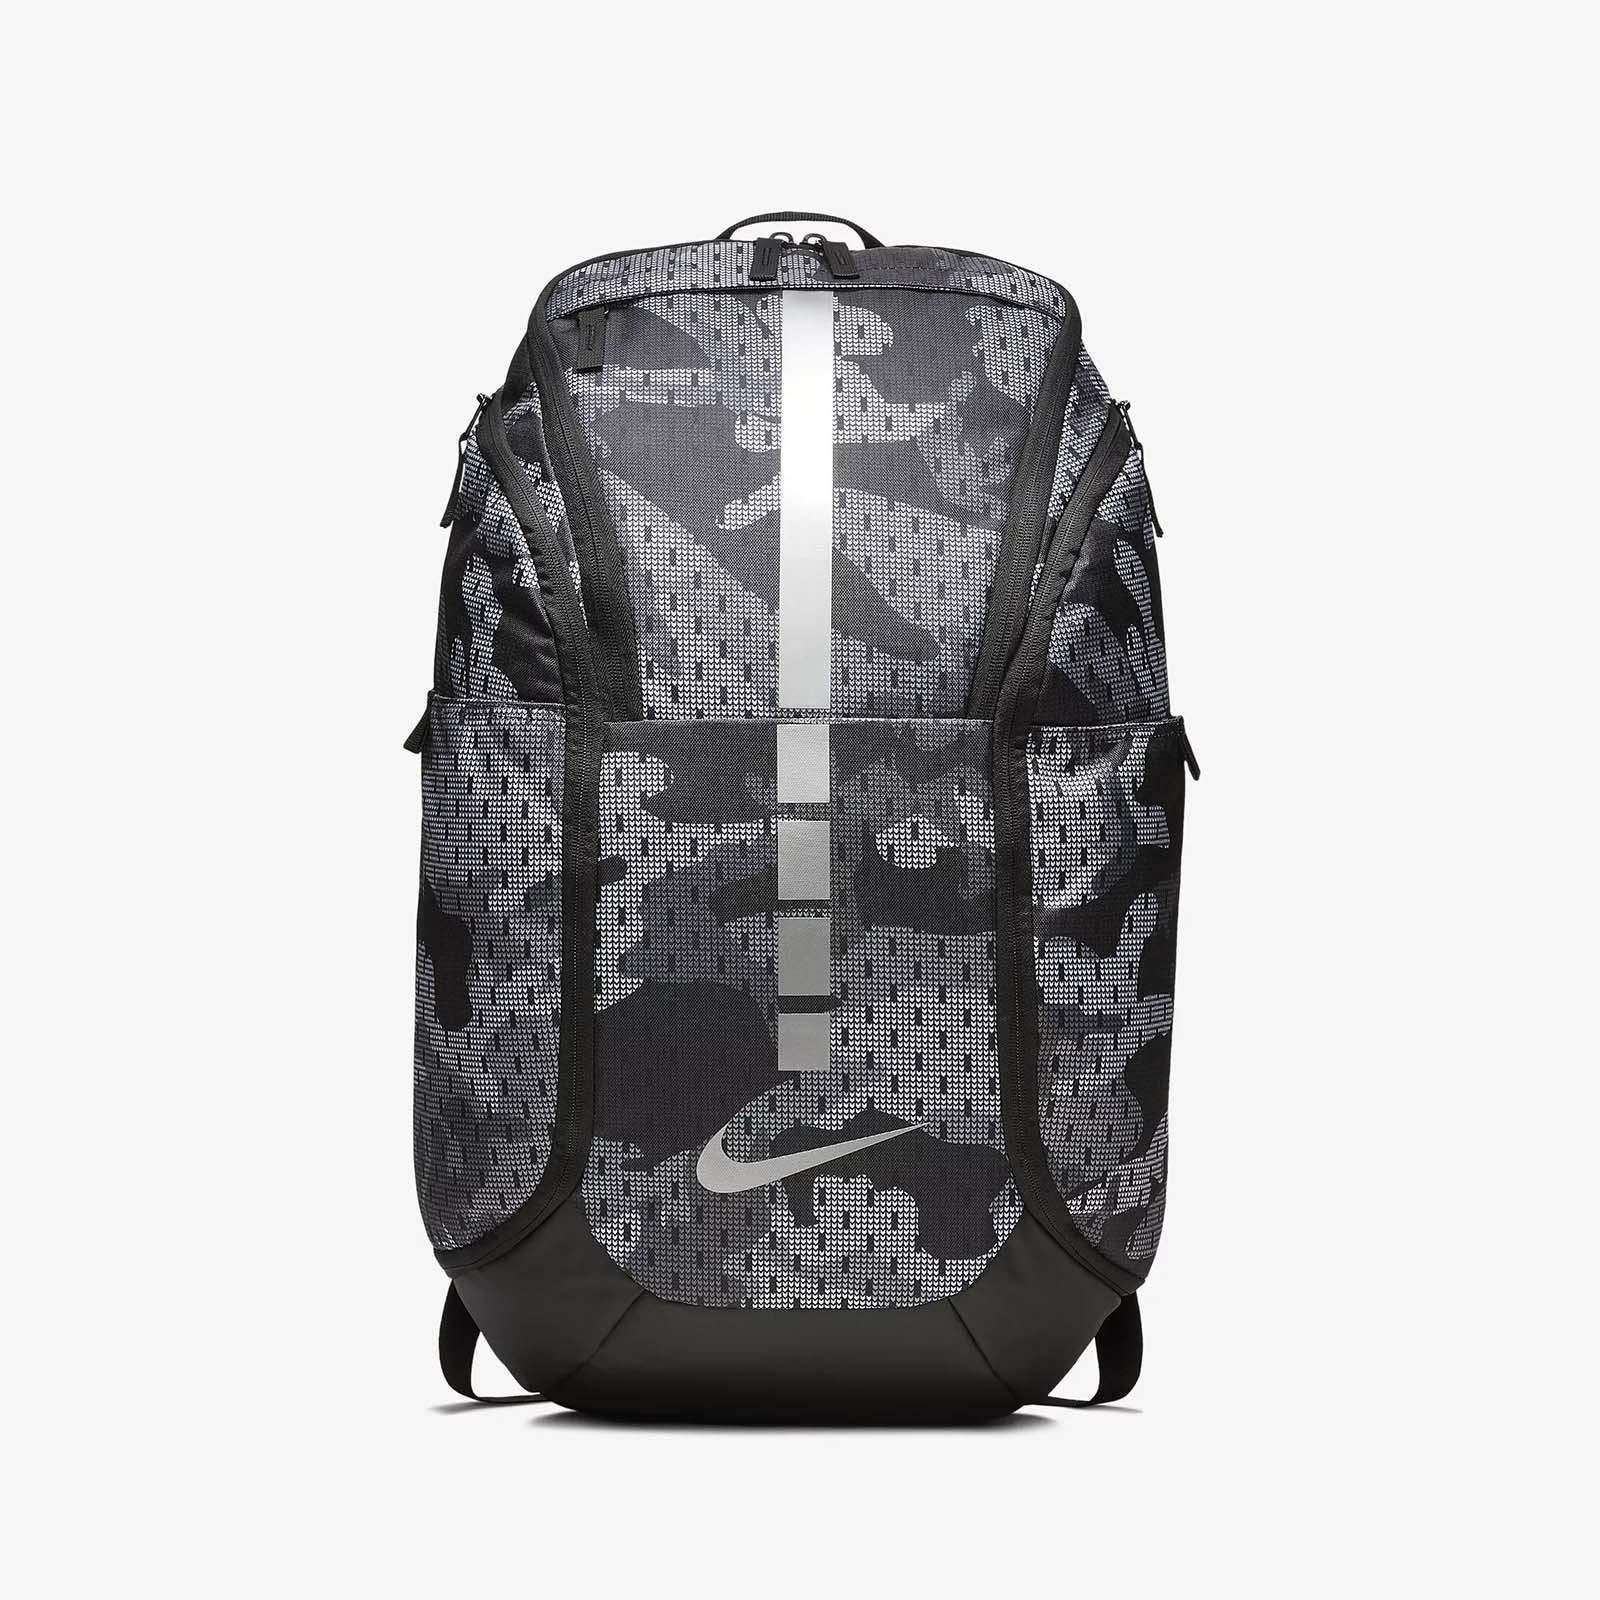 1b5de21601f Galleon - Nike Hoops Elite Hoops Pro Basketball Camo Backpack Gym  (Gunsmoke/Black/Metallic Cool Grey)